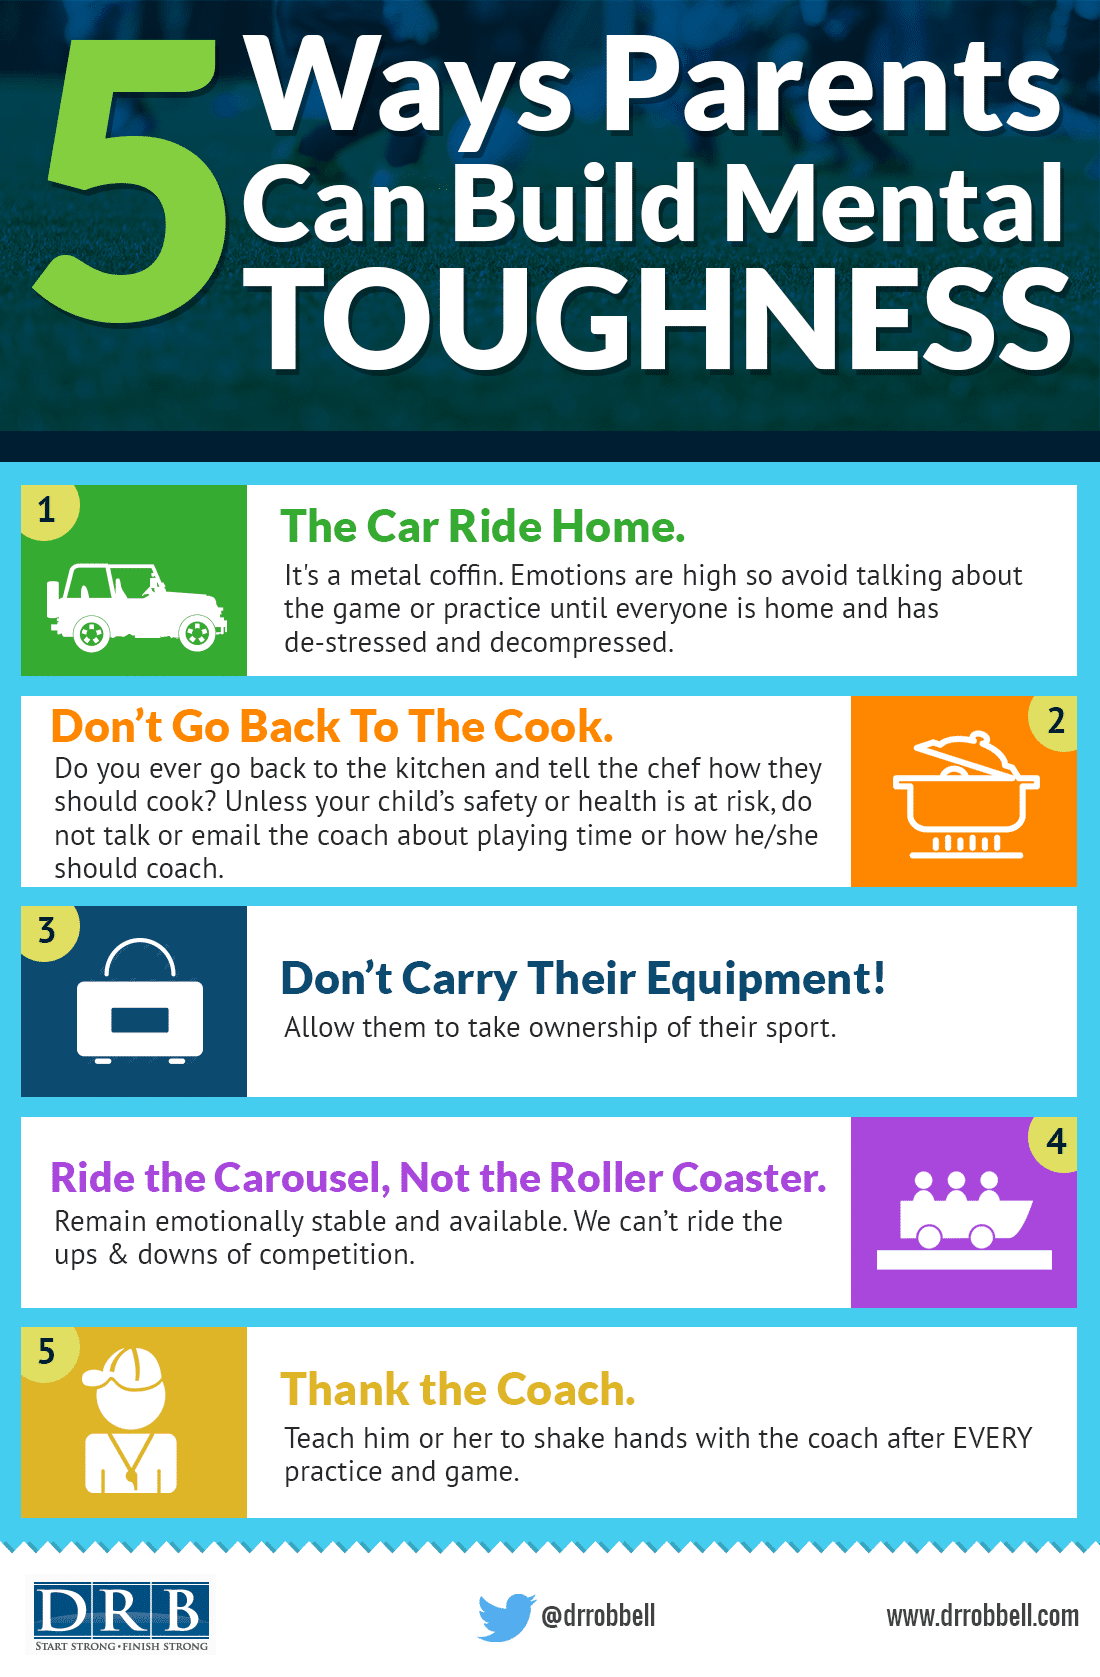 Infographic 5 Ways Parents Can Build Mental Toughness